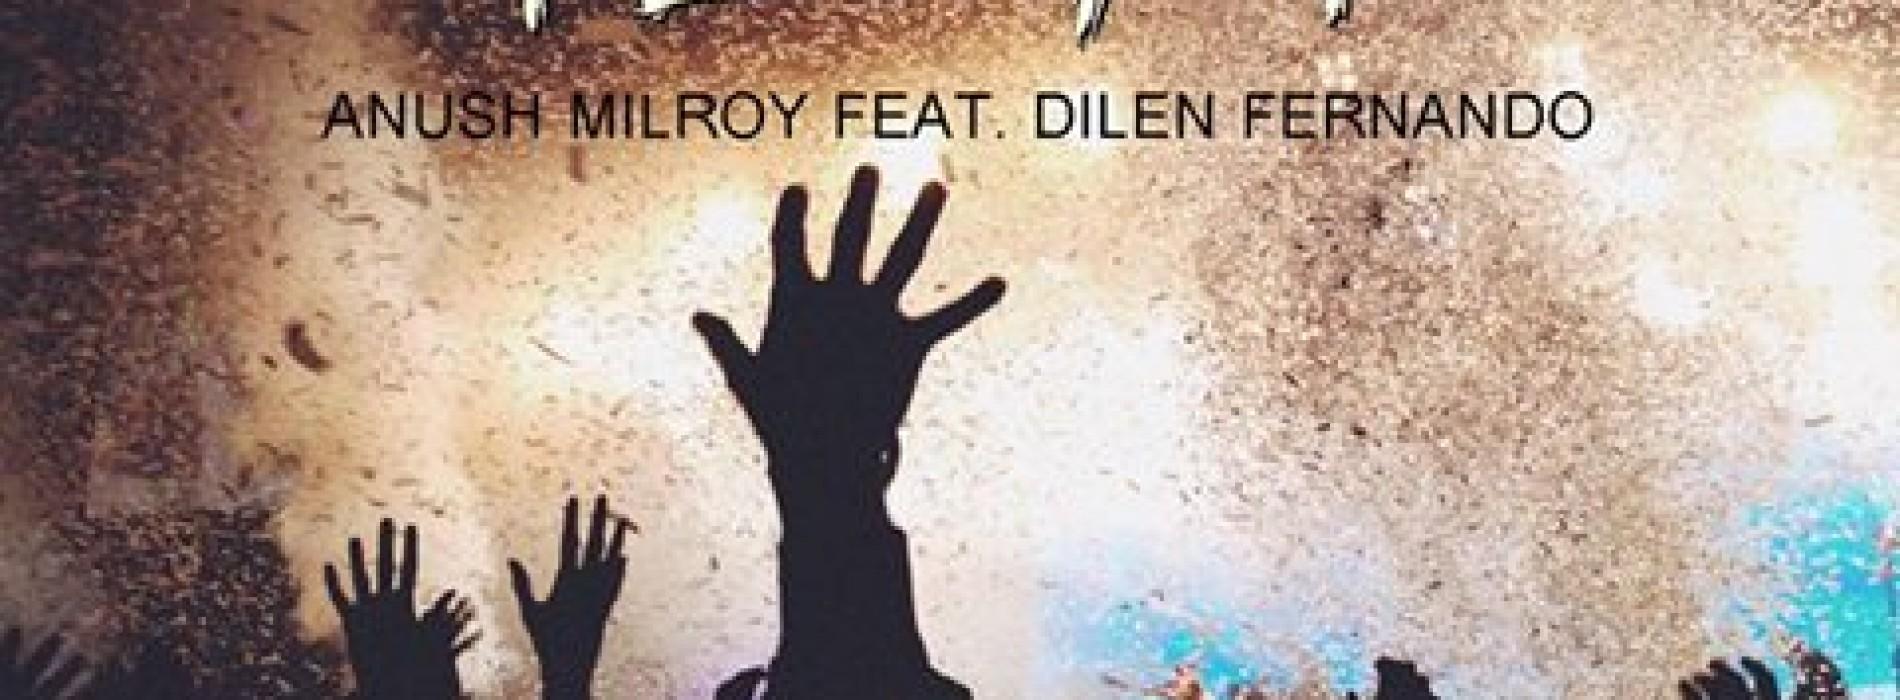 Anush Milroy Ft. Dilen Fernando – Fight (Original Mix)